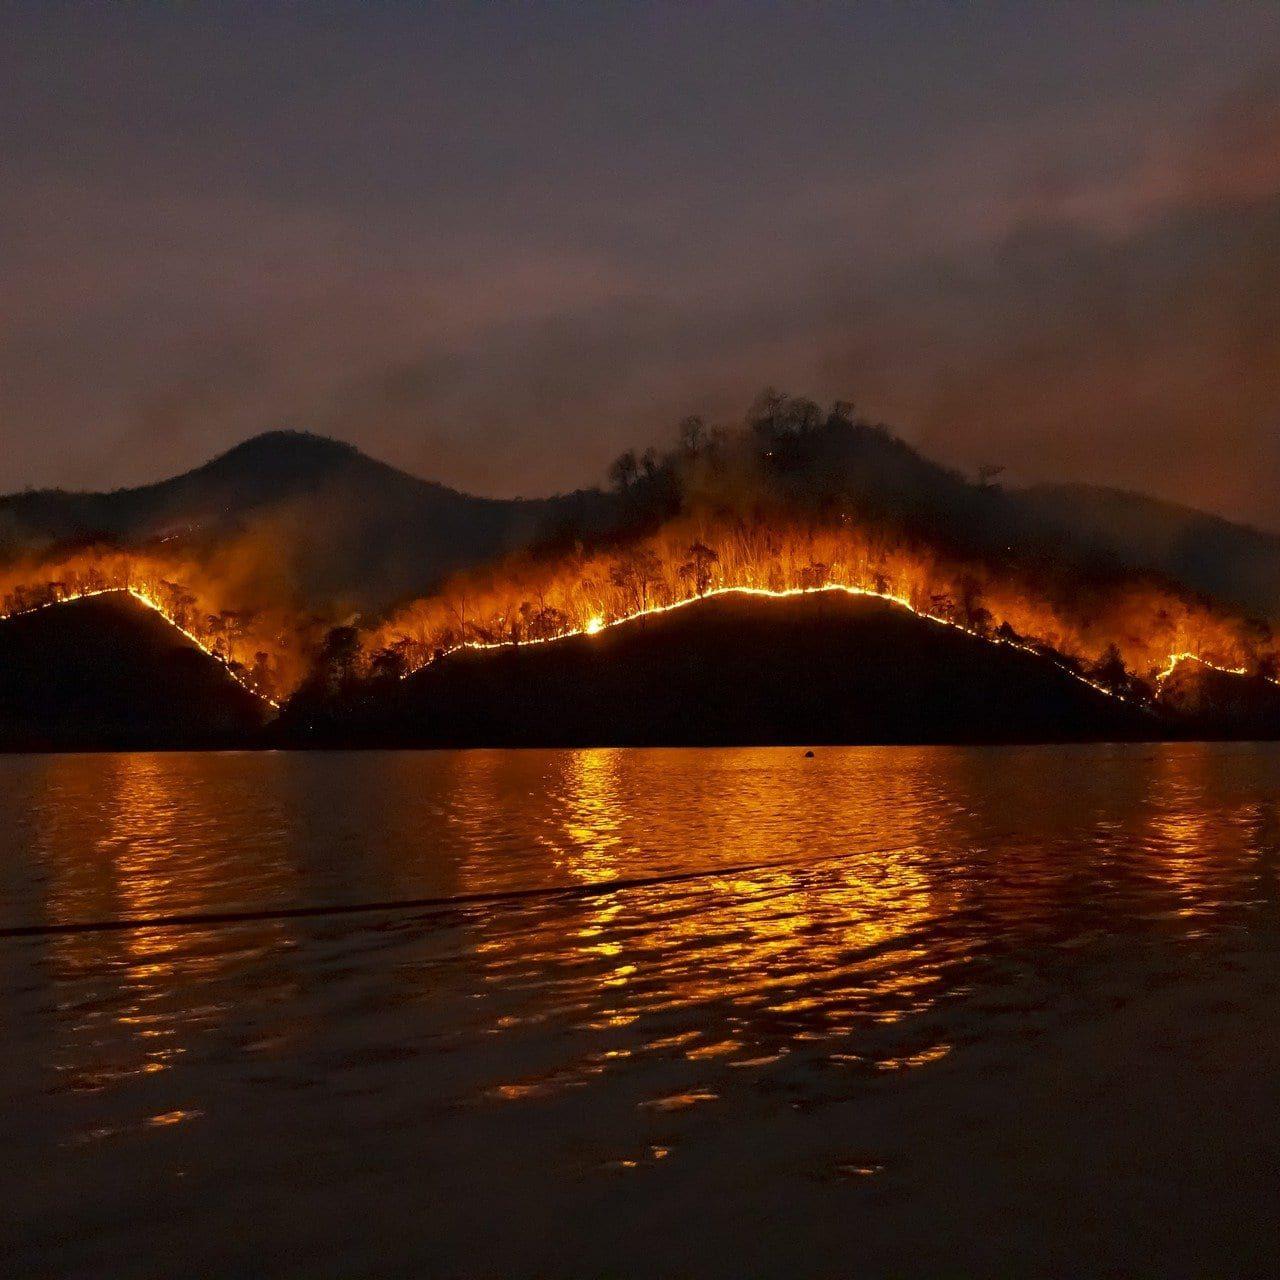 wildfire-4755030_1920